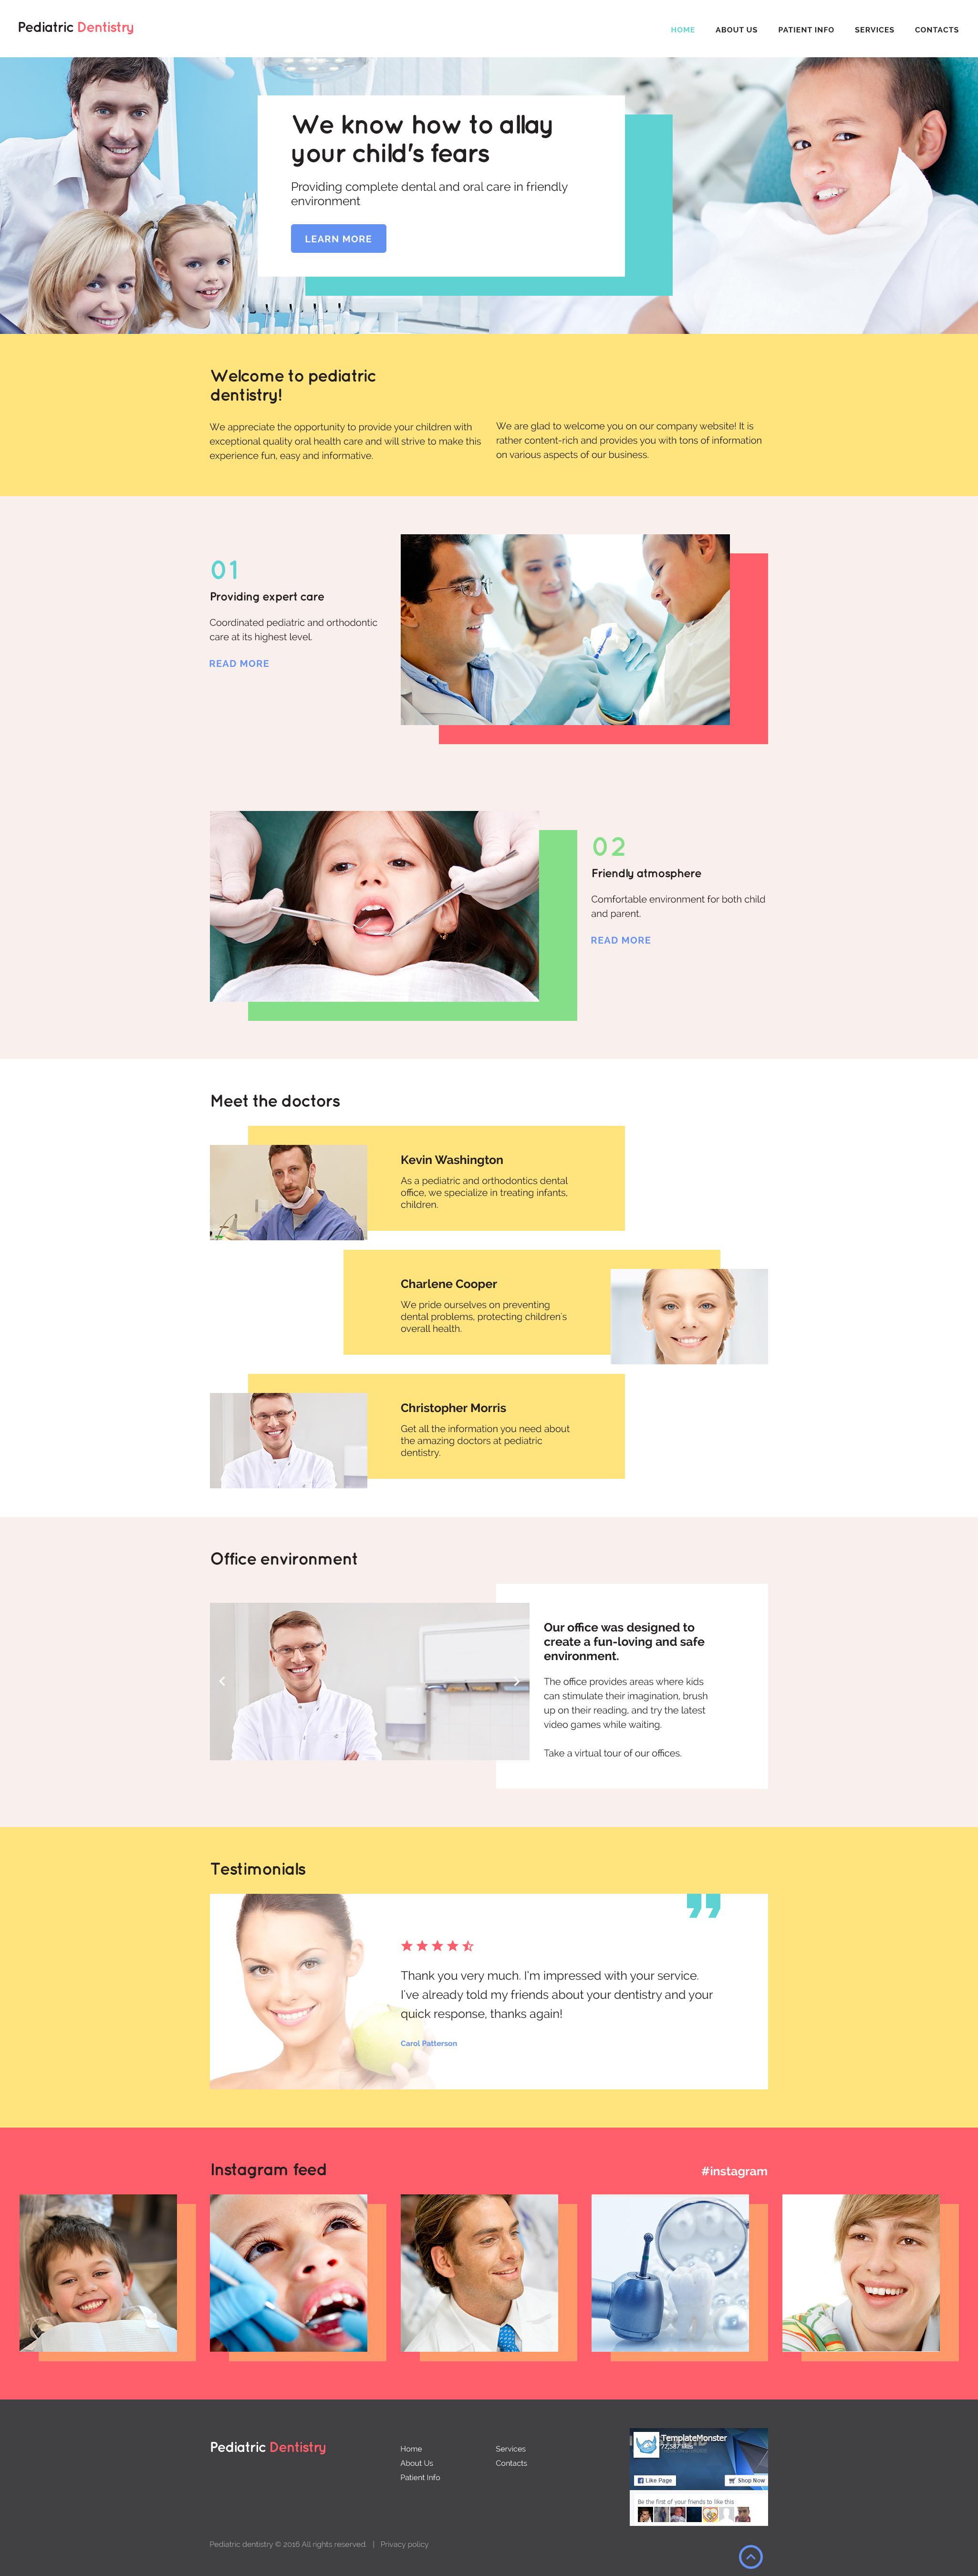 """Pediatric Dentistry"" modèle web adaptatif #57696"